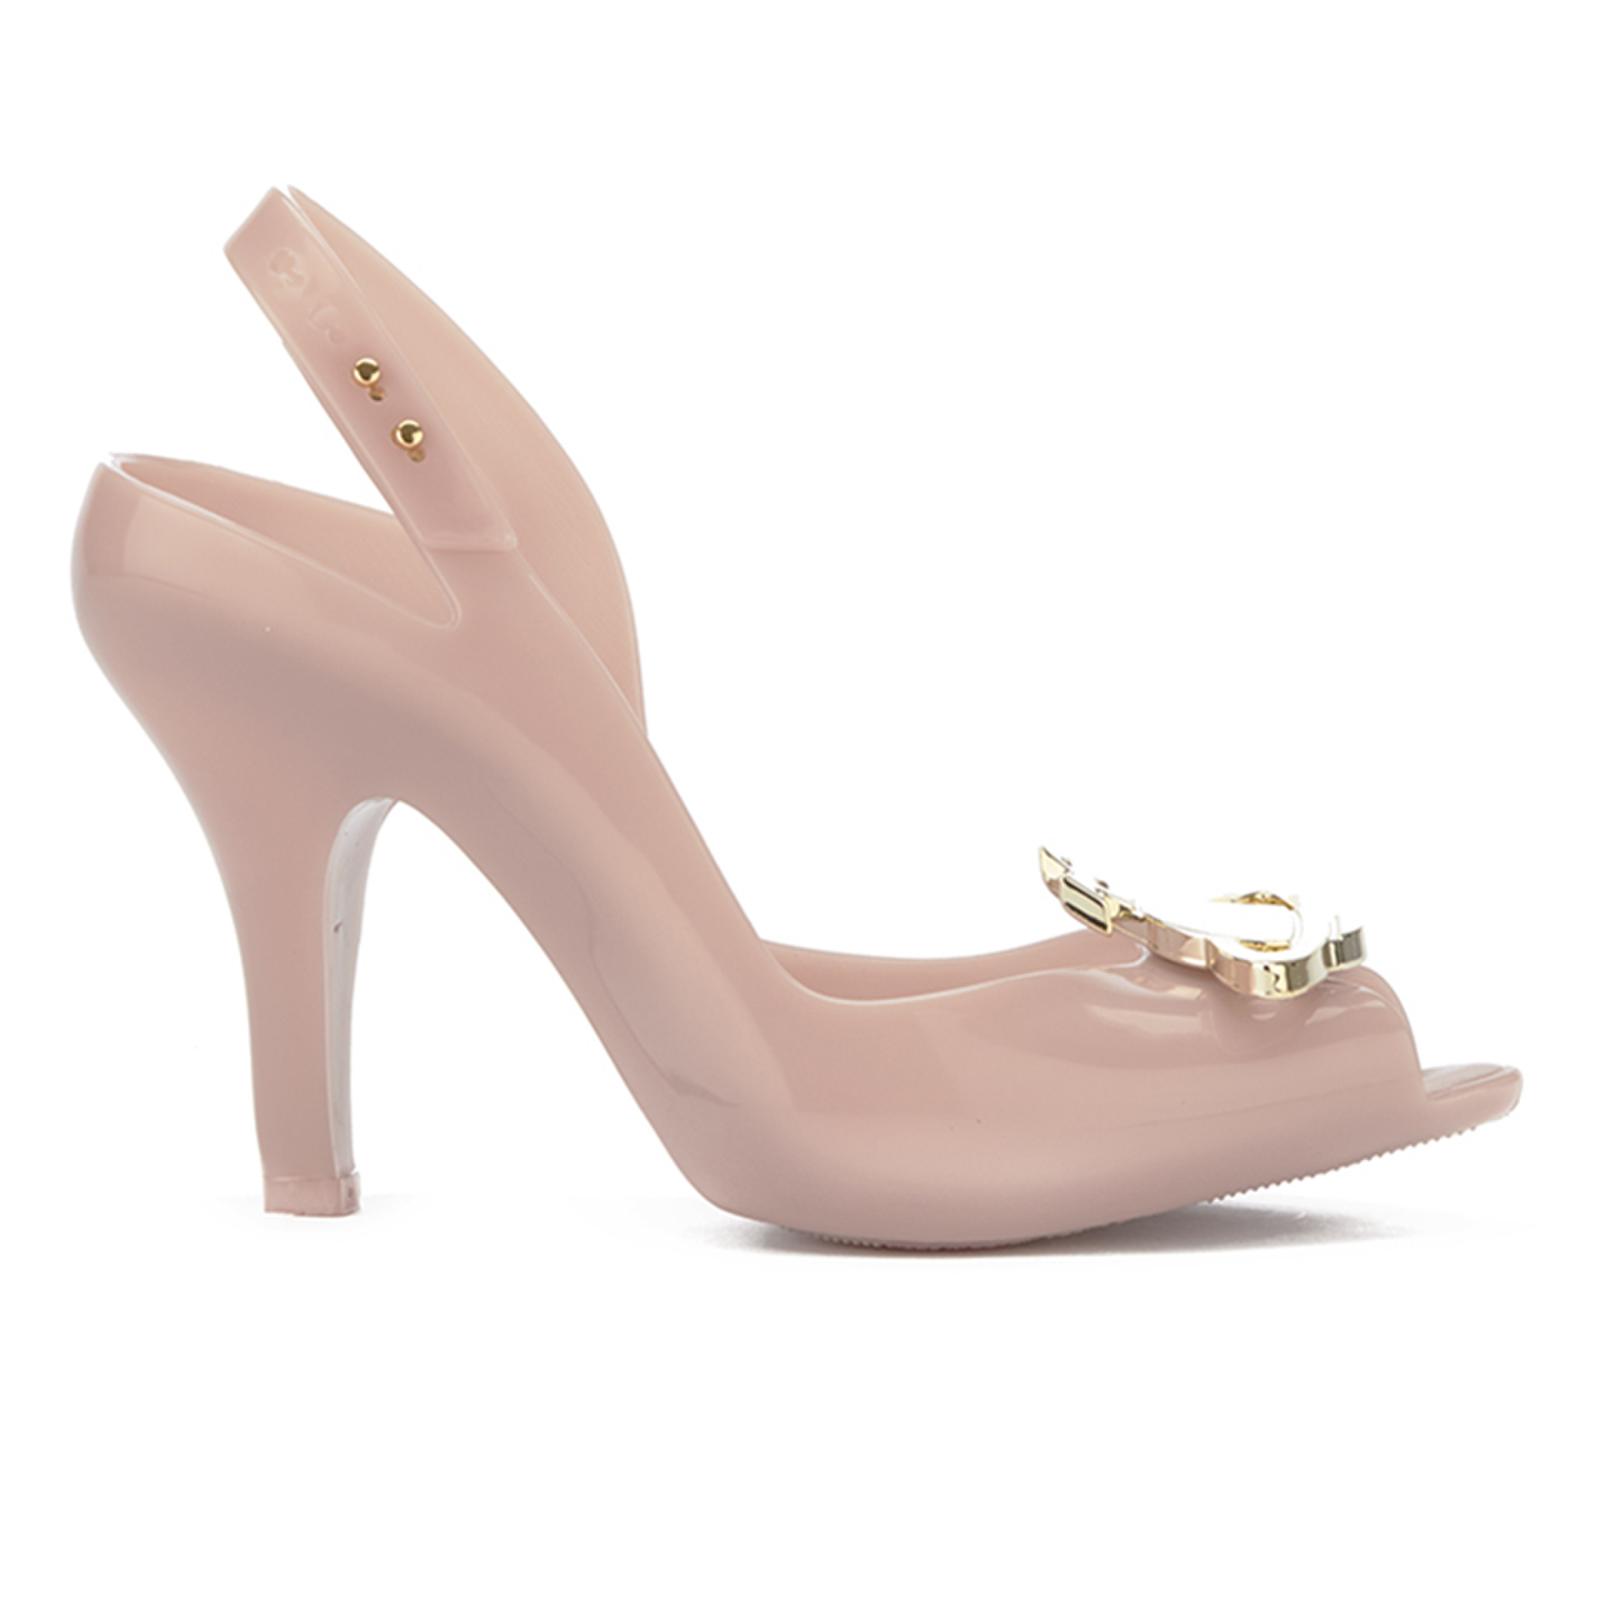 80053f06c6c Vivienne Westwood for Melissa Women's Lady Dragon 16 Peep Toe Heeled  Sandals - Nude Orb